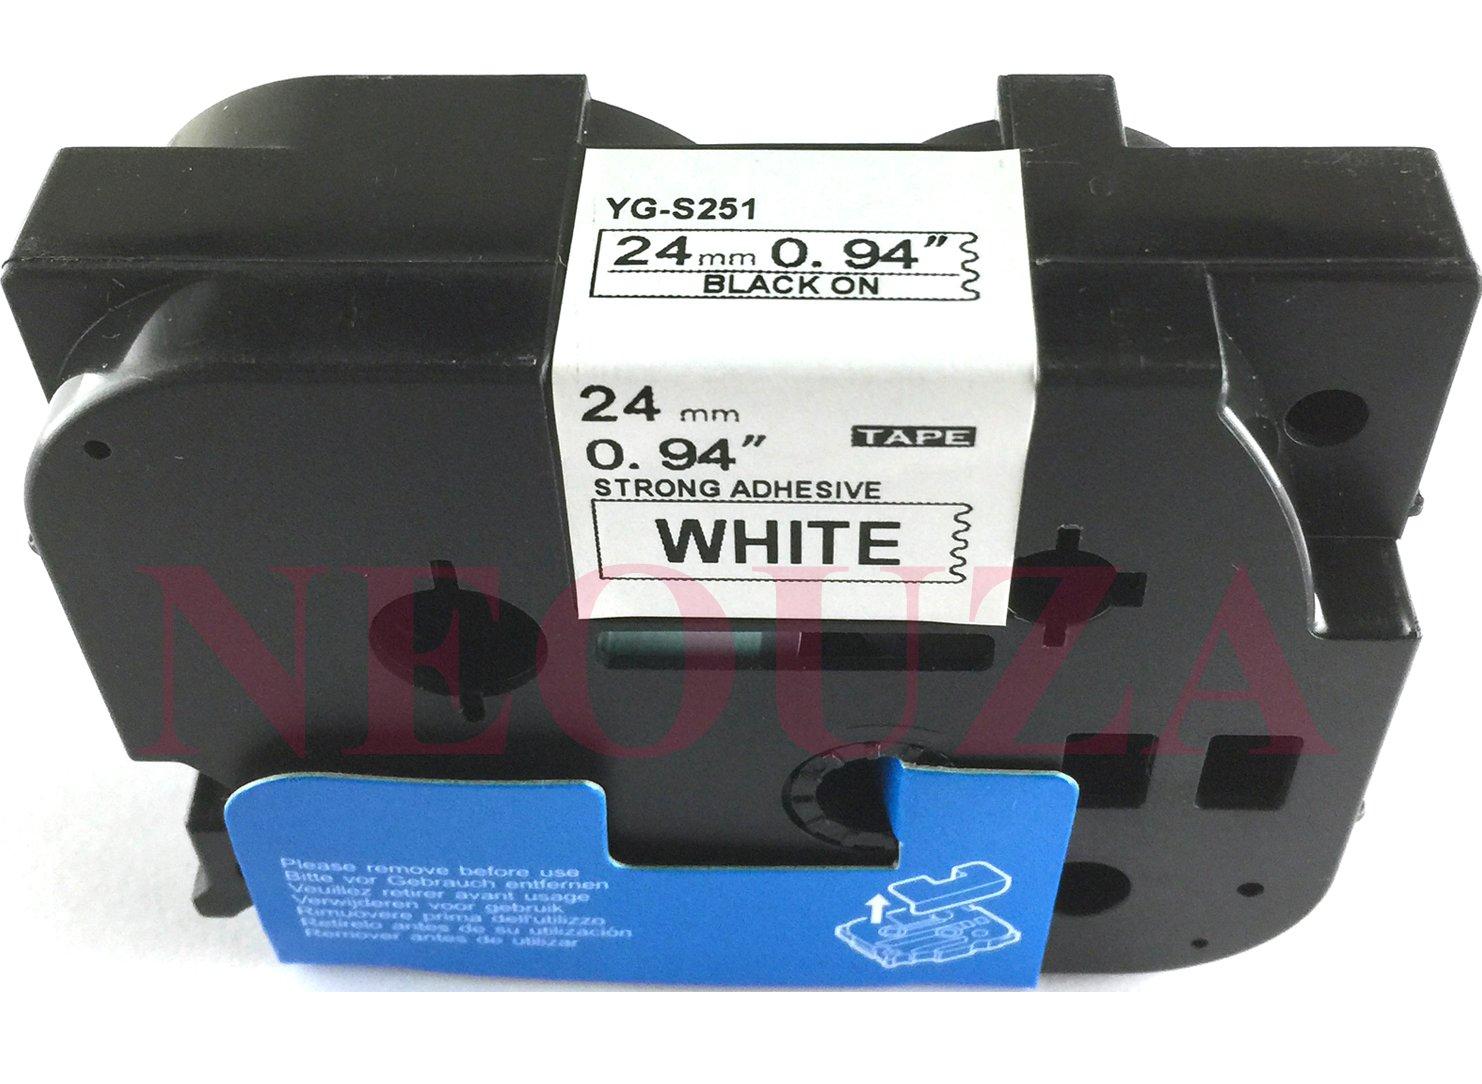 ACD extra forza adesiva compatibile per Brother P-Touch TZe TZ nero su bianco Label tape 6/mm 9/mm 12/mm 18/mm 24/mm 36/mm TZe-S241 18mm Black//White